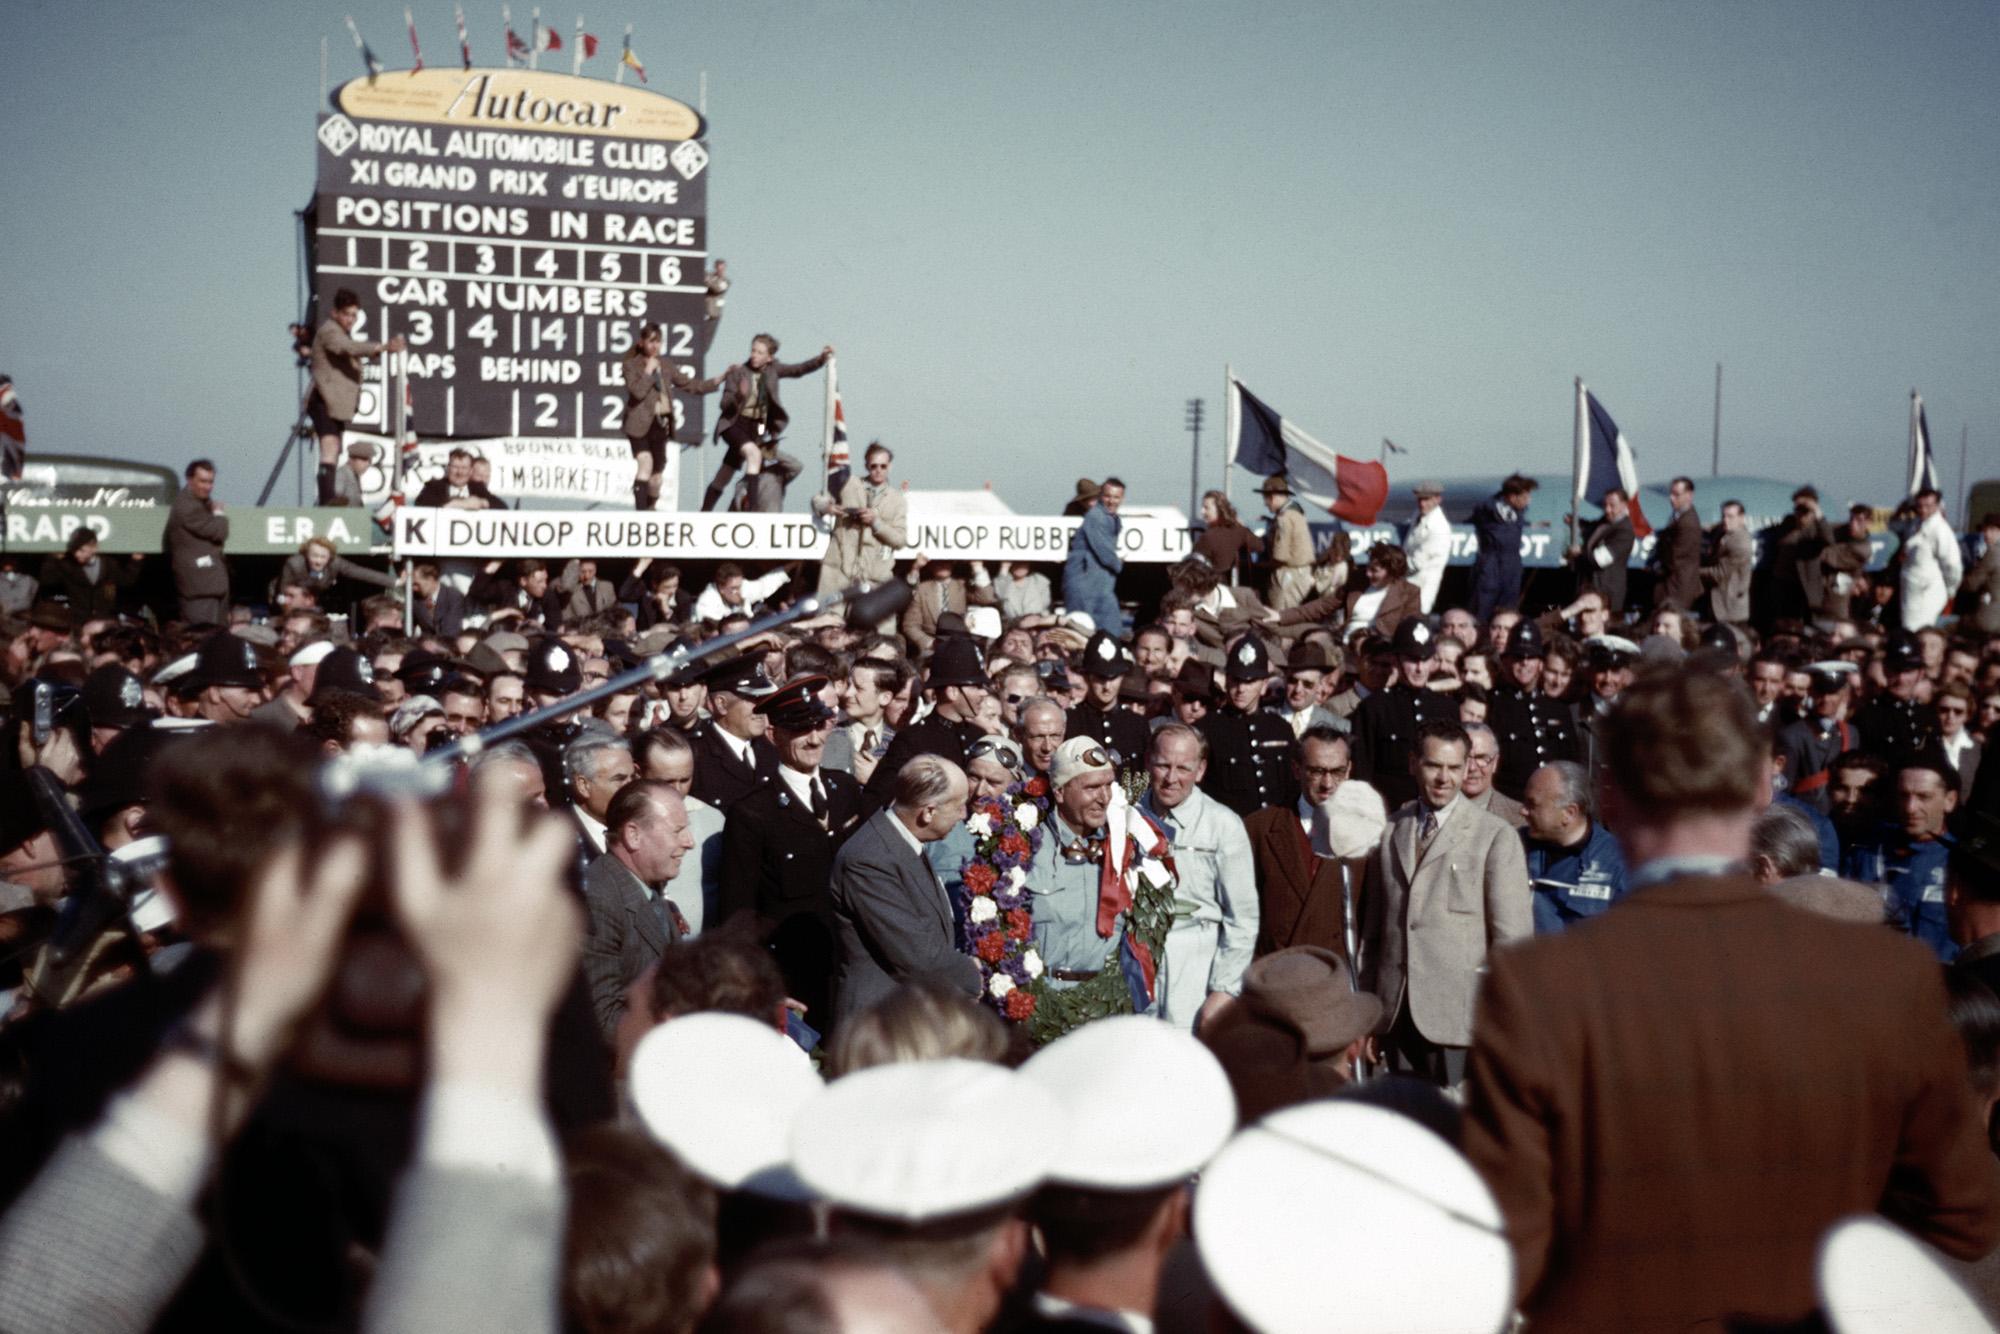 Crowds around Giuseppe Farina after the 1950 British Grand Prix